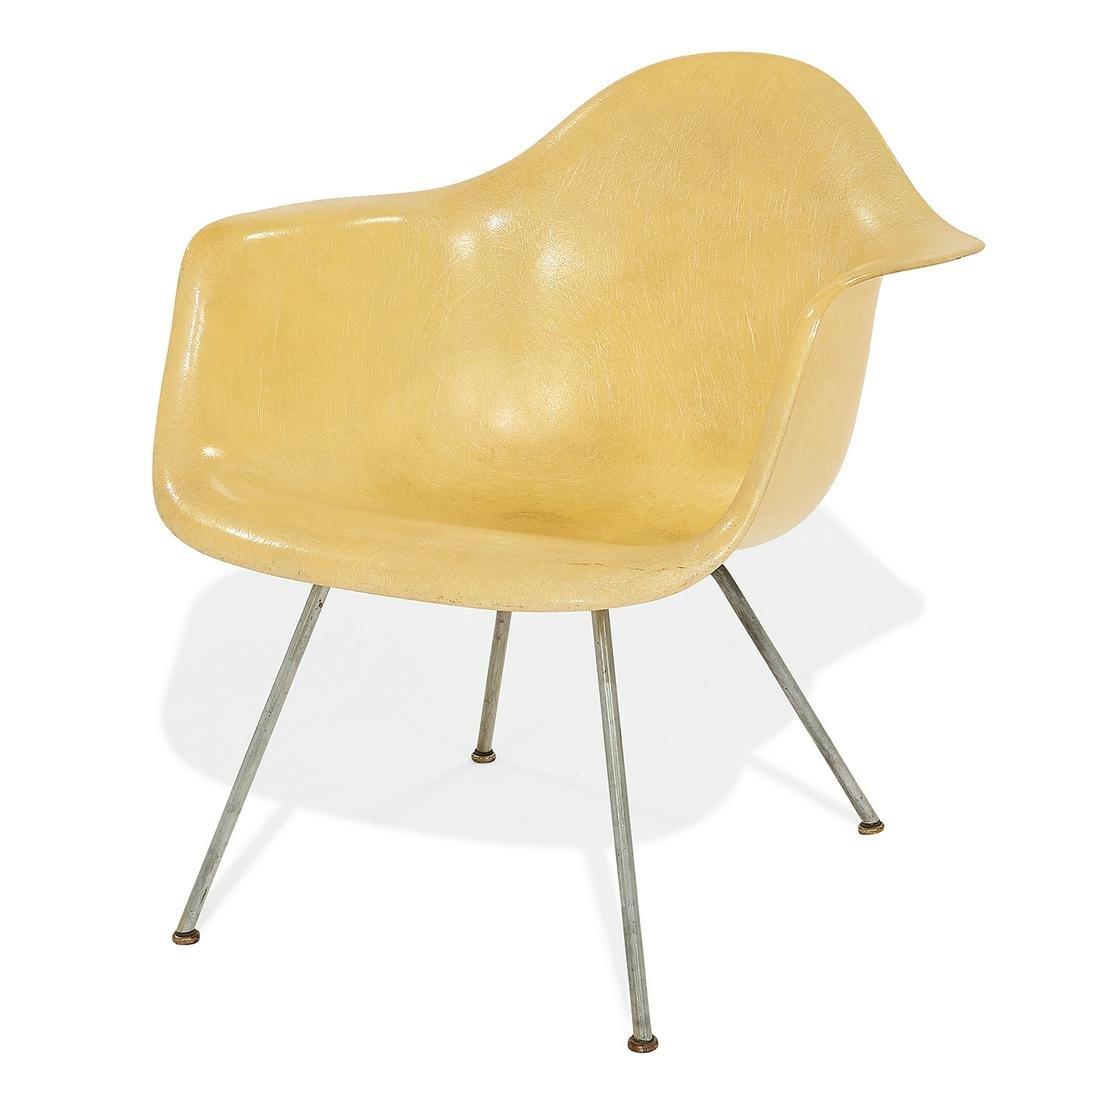 Eames for Herman Miller DAX Zenith armchair